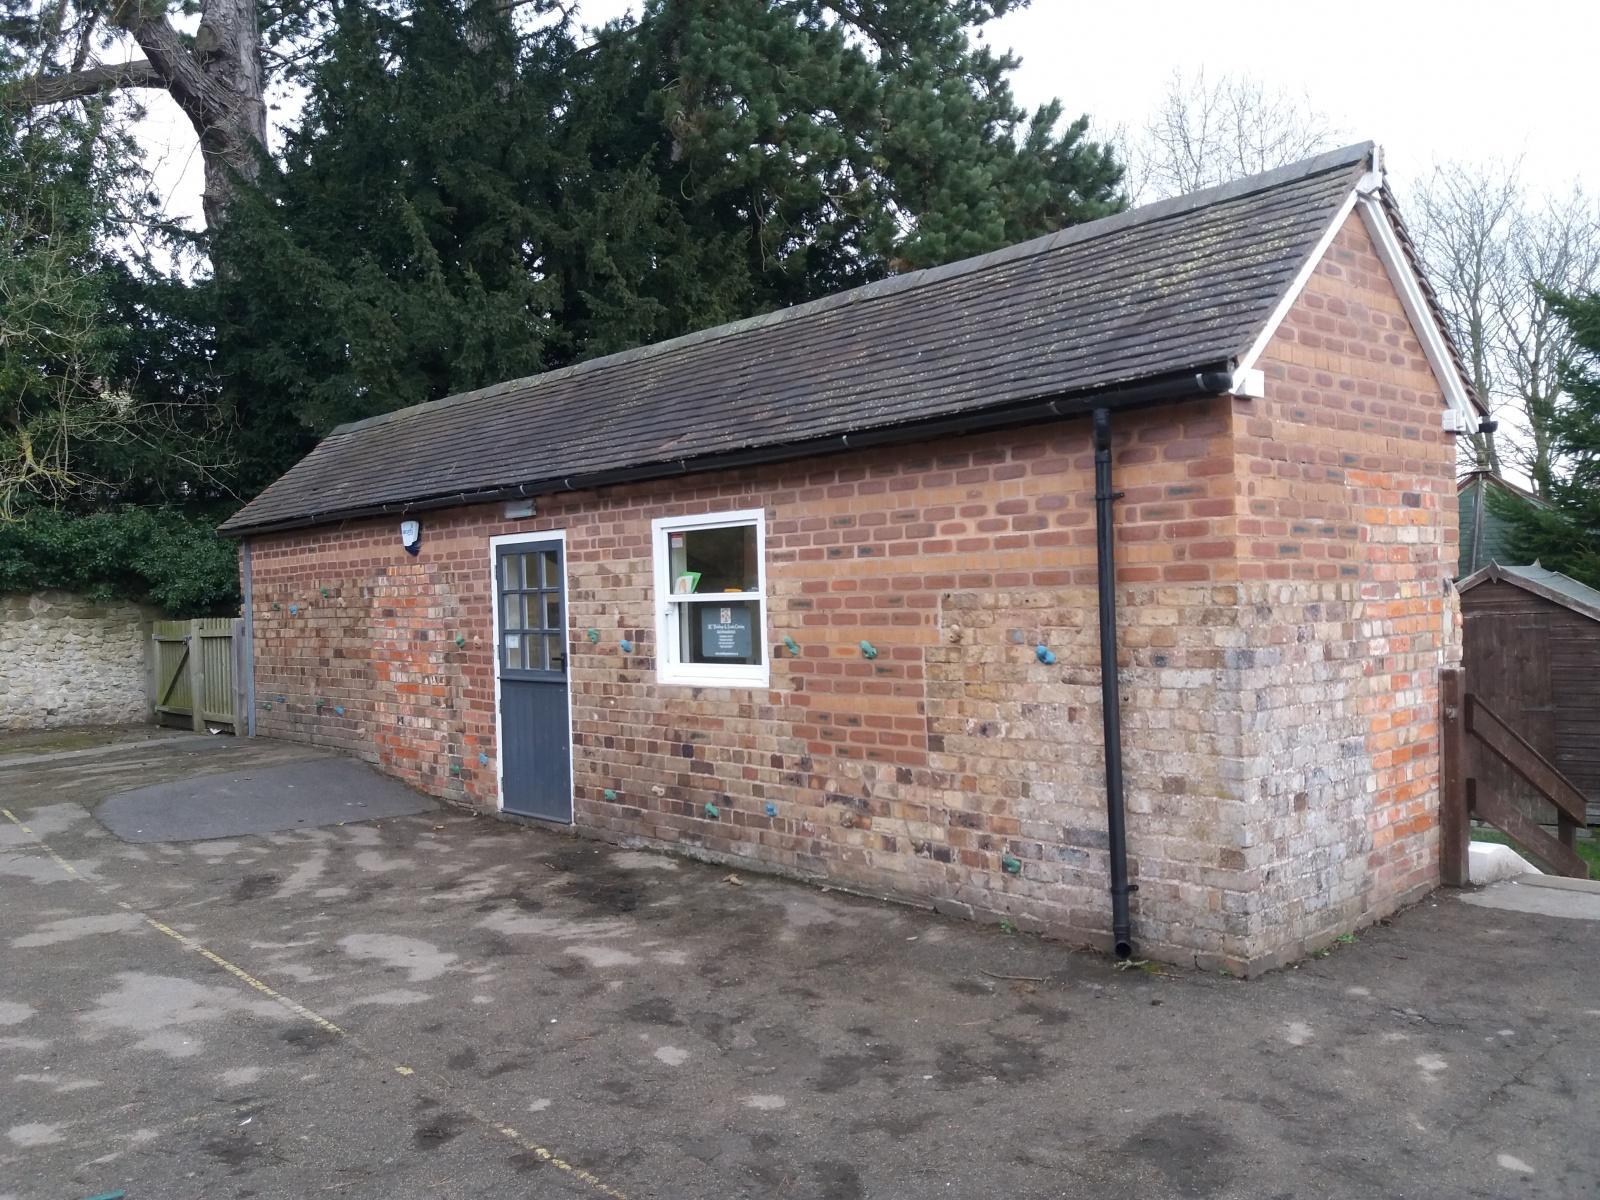 Commercial Kitchen Facility , Rushbury C.e. Primary School, Rushbury, Church Stretton, Shropshire